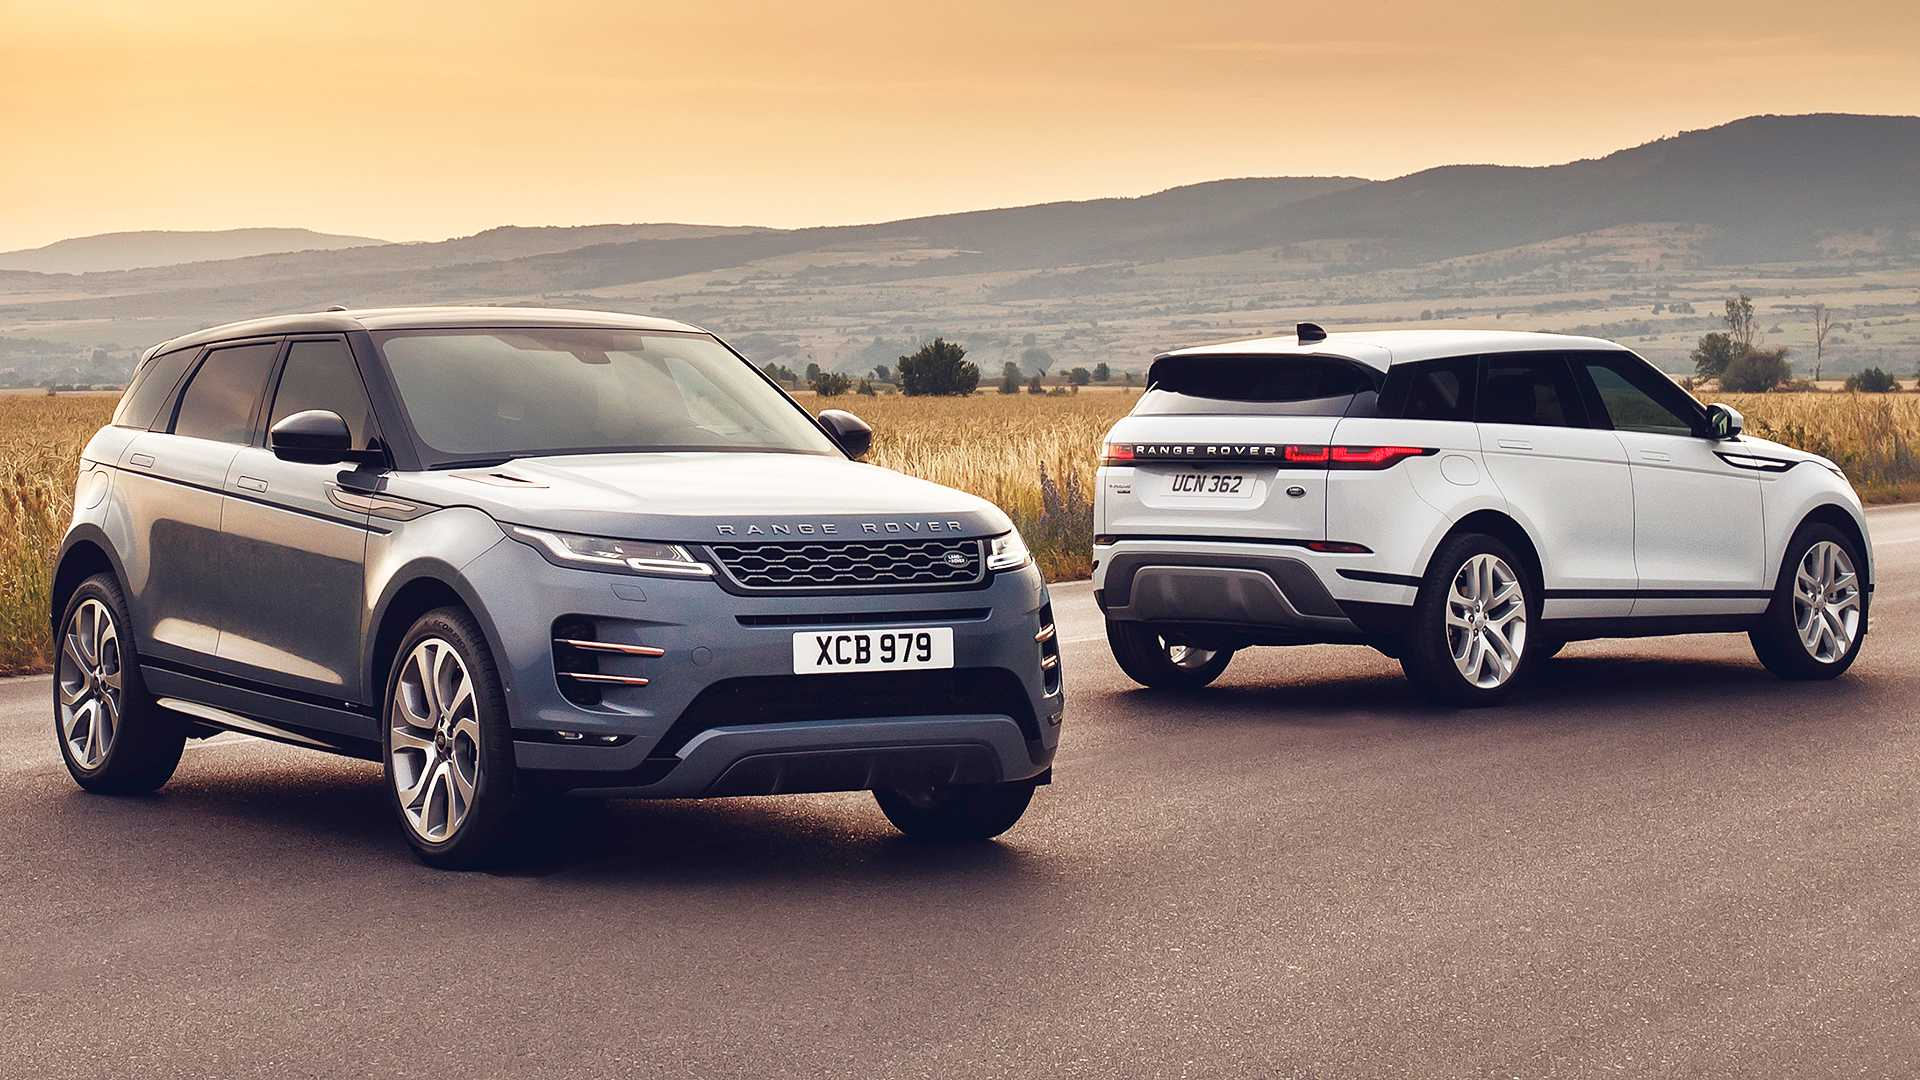 84 All New New Jaguar Land Rover Holidays 2019 Specs Redesign and Concept by New Jaguar Land Rover Holidays 2019 Specs